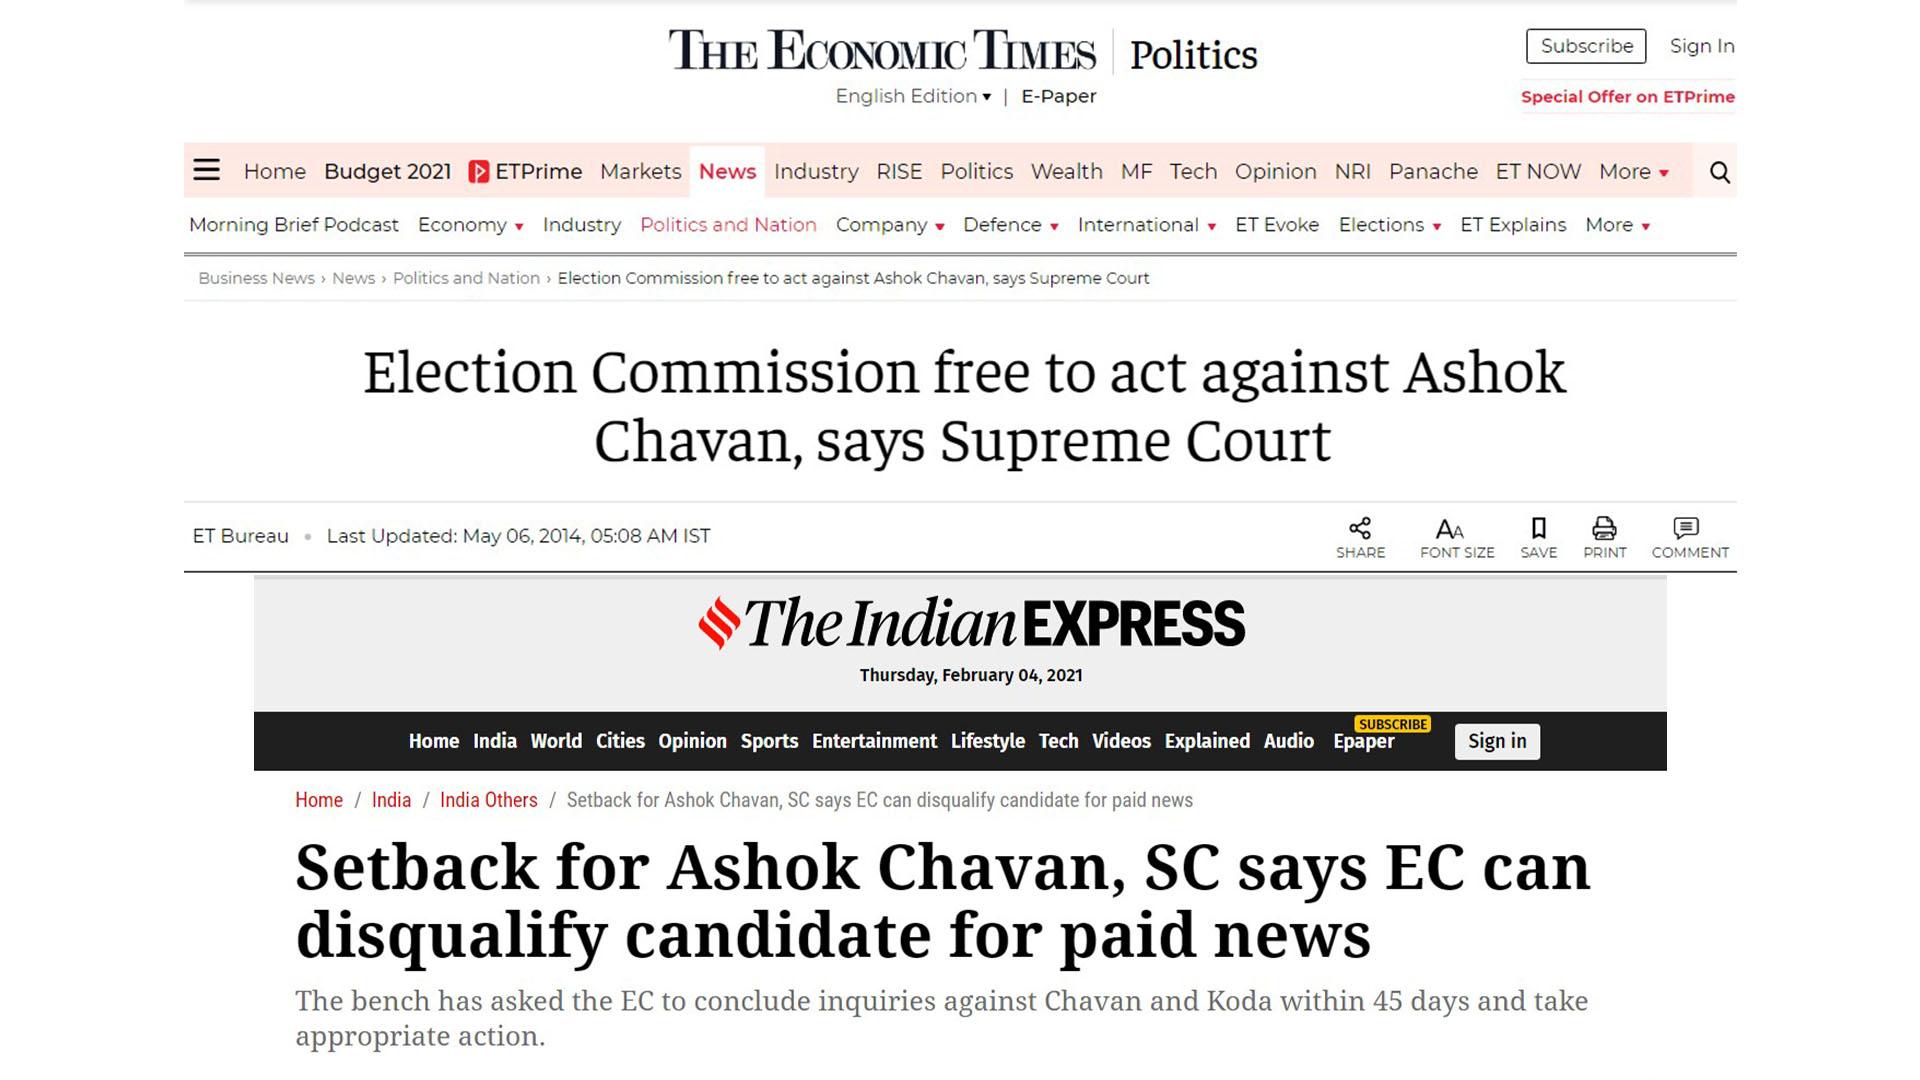 Ashok Chavan Case, 2014 (Paid news case)